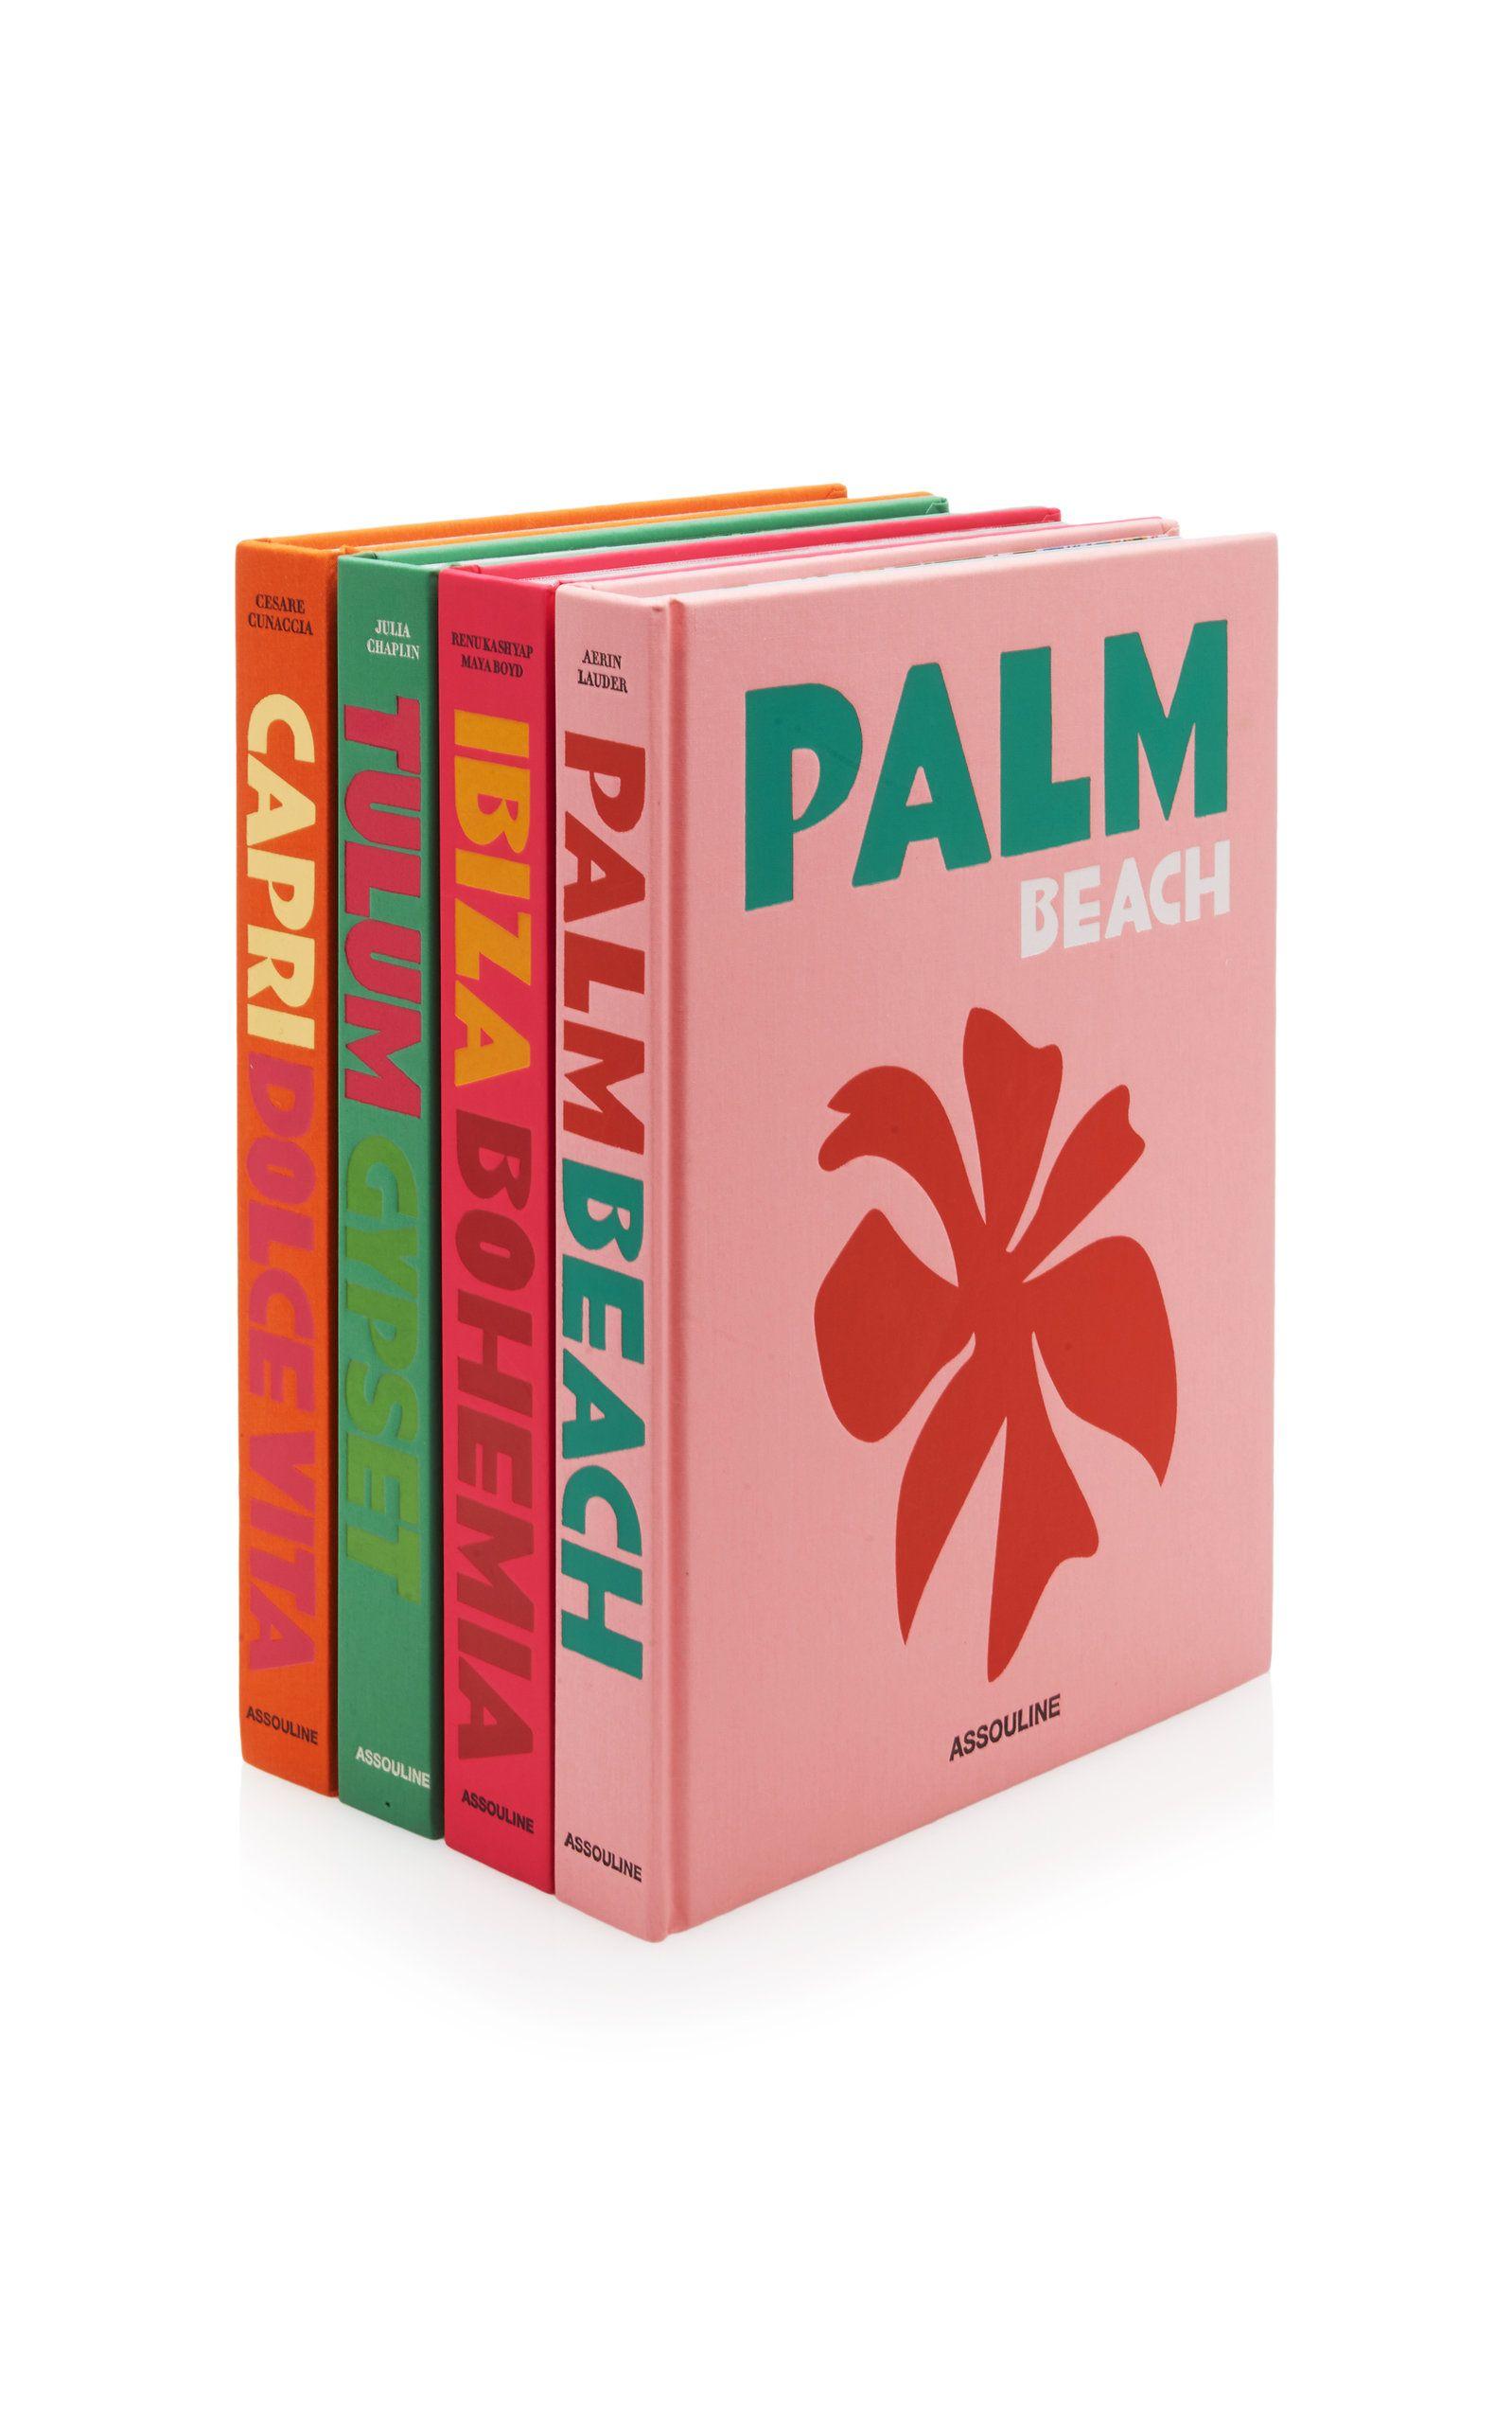 Assouline Capri Dolce Vita, Palm Beach, Tulum Gypset, Ibiza Bohemia Hardcover Book Set